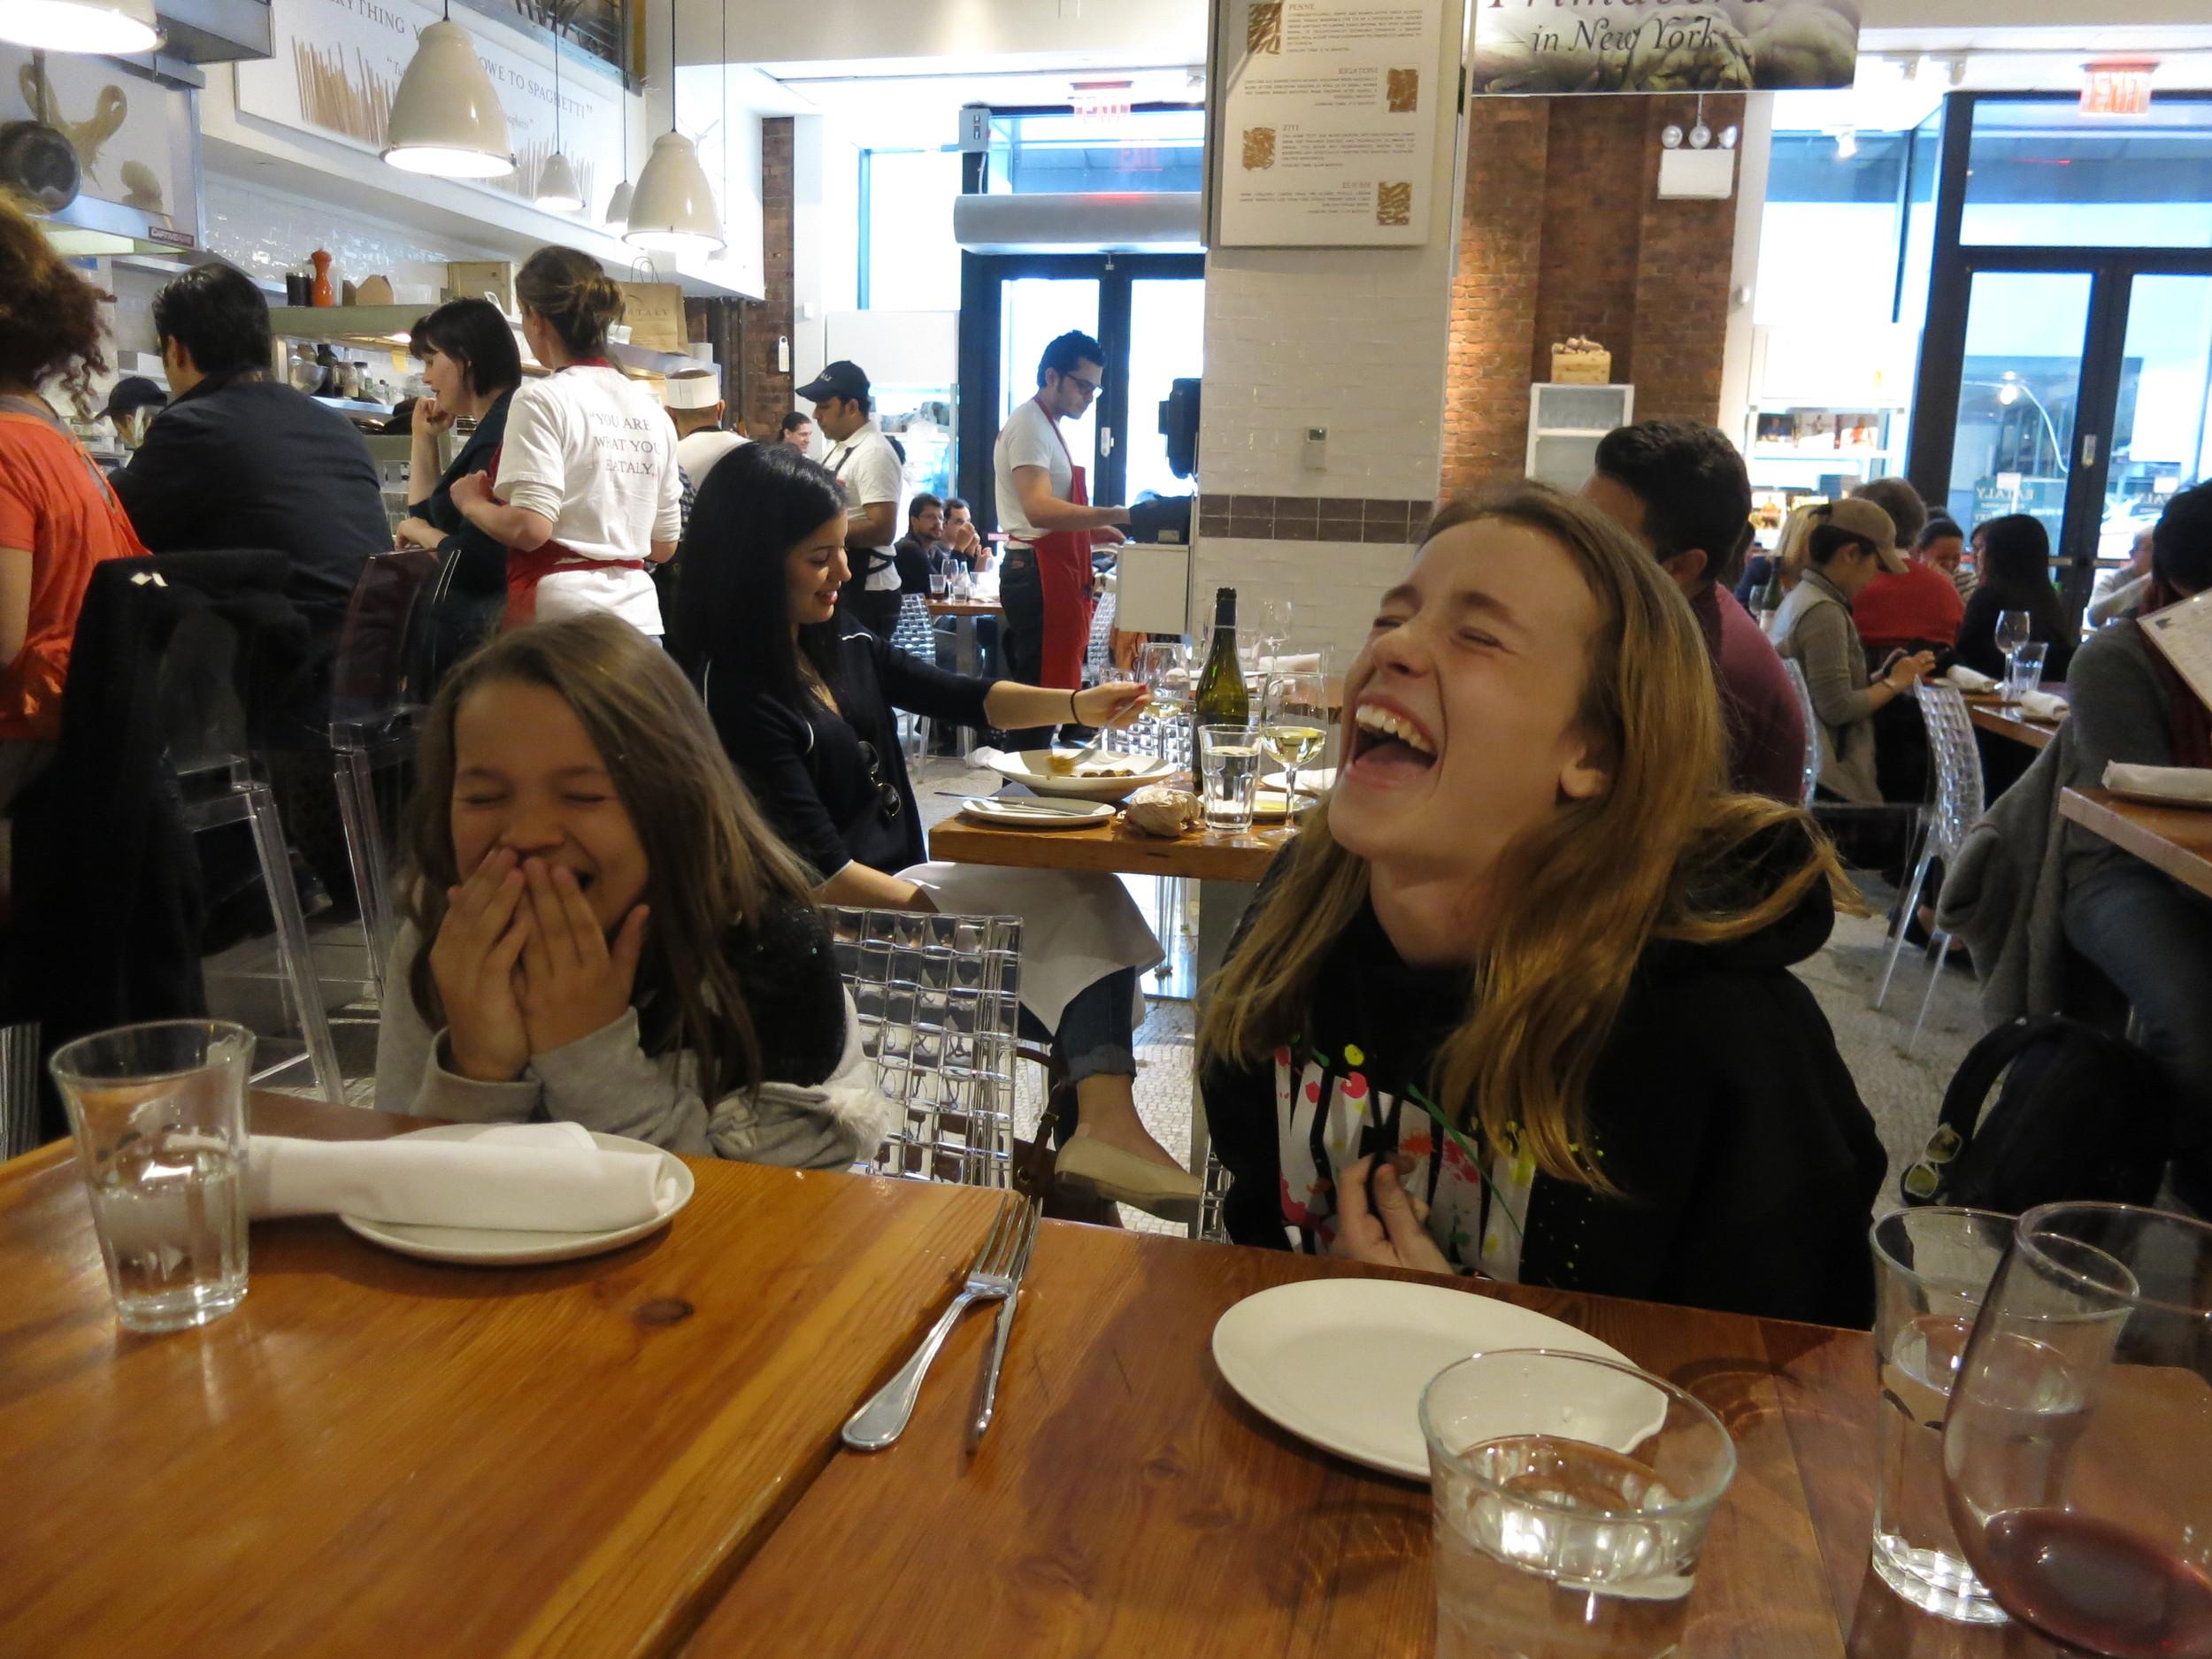 Sophia and Isabella Candelaria sharing a laugh at Eataly, NYC